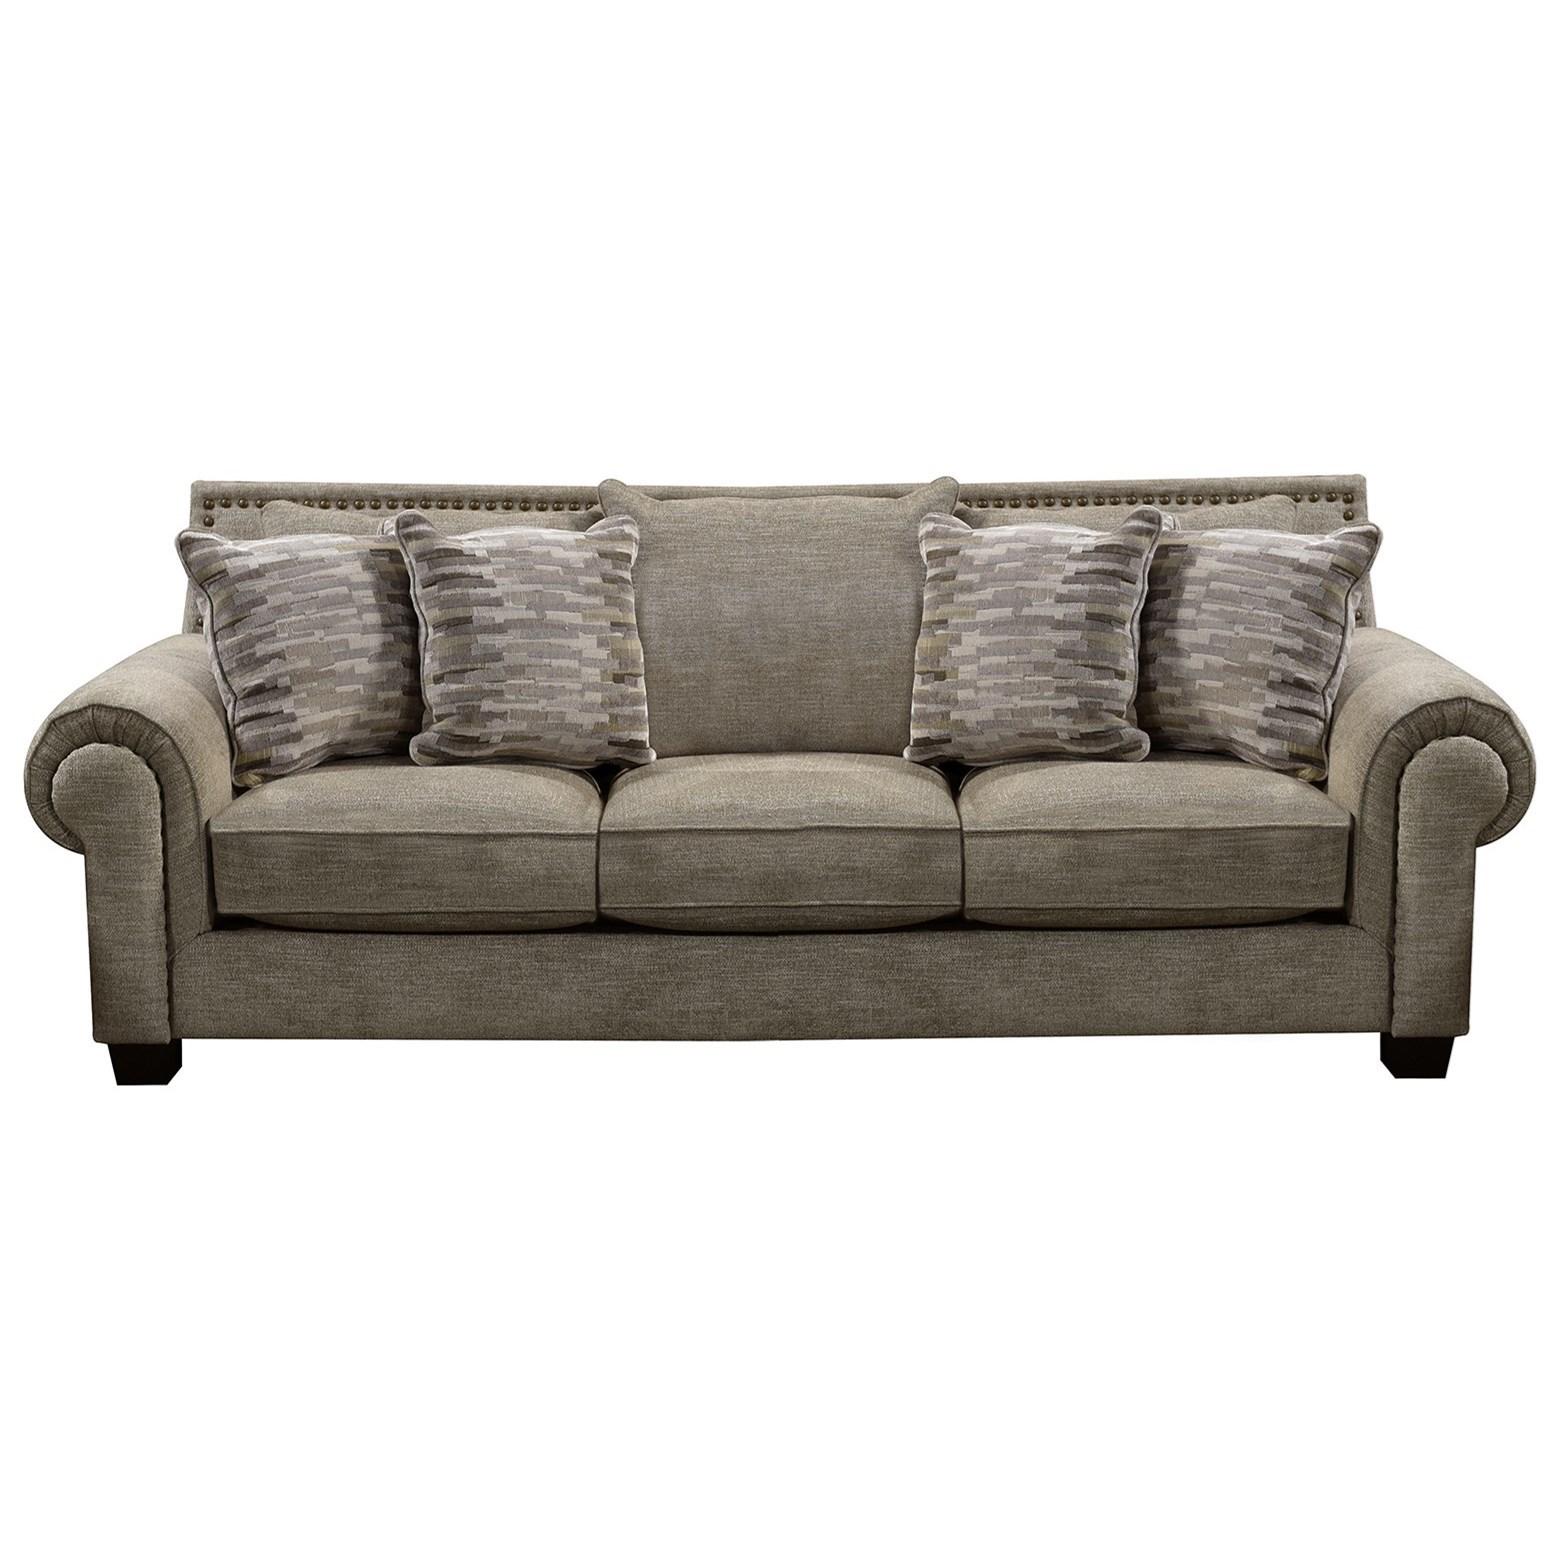 England Larado Transitional Sofa With Nailhead Trim